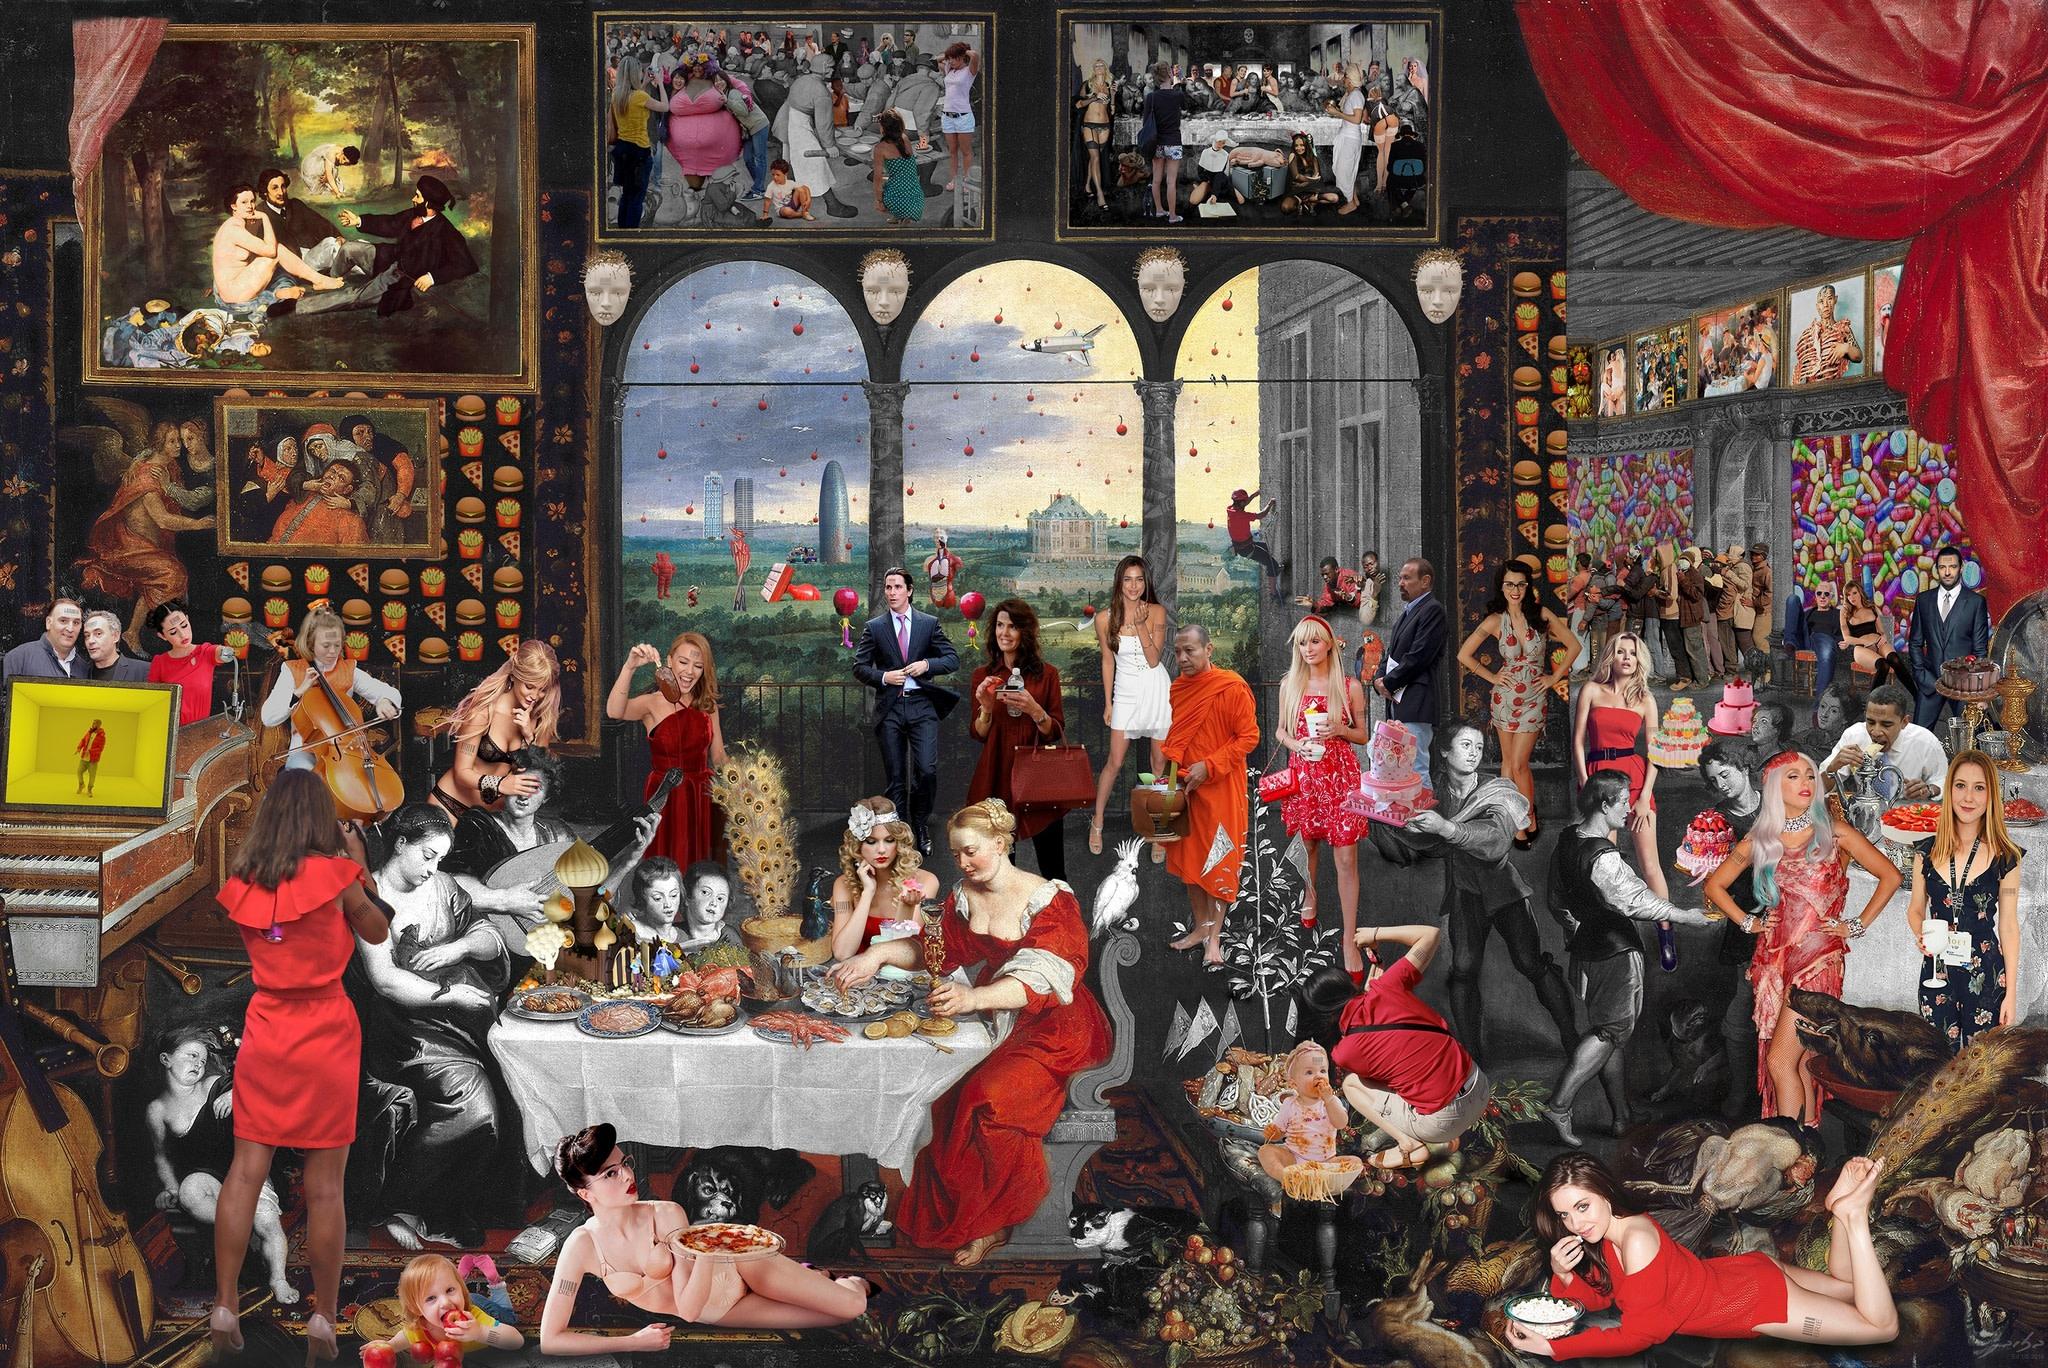 "<span class=""link fancybox-details-link""><a href=""/exhibitions/28/works/artworks1417/"">View Detail Page</a></span><div class=""artist""><strong>Lluís Barba</strong></div><div class=""title""><em>Taste. Jan Brueghel & Peter Paul Rubens</em>, 2016</div><div class=""medium"">C-Type Print, Diasec Mounted<br> </div><div class=""dimensions"">162.6 x 243.8 cm<br>64 x 96 in.</div><div class=""edition_details""></div>"